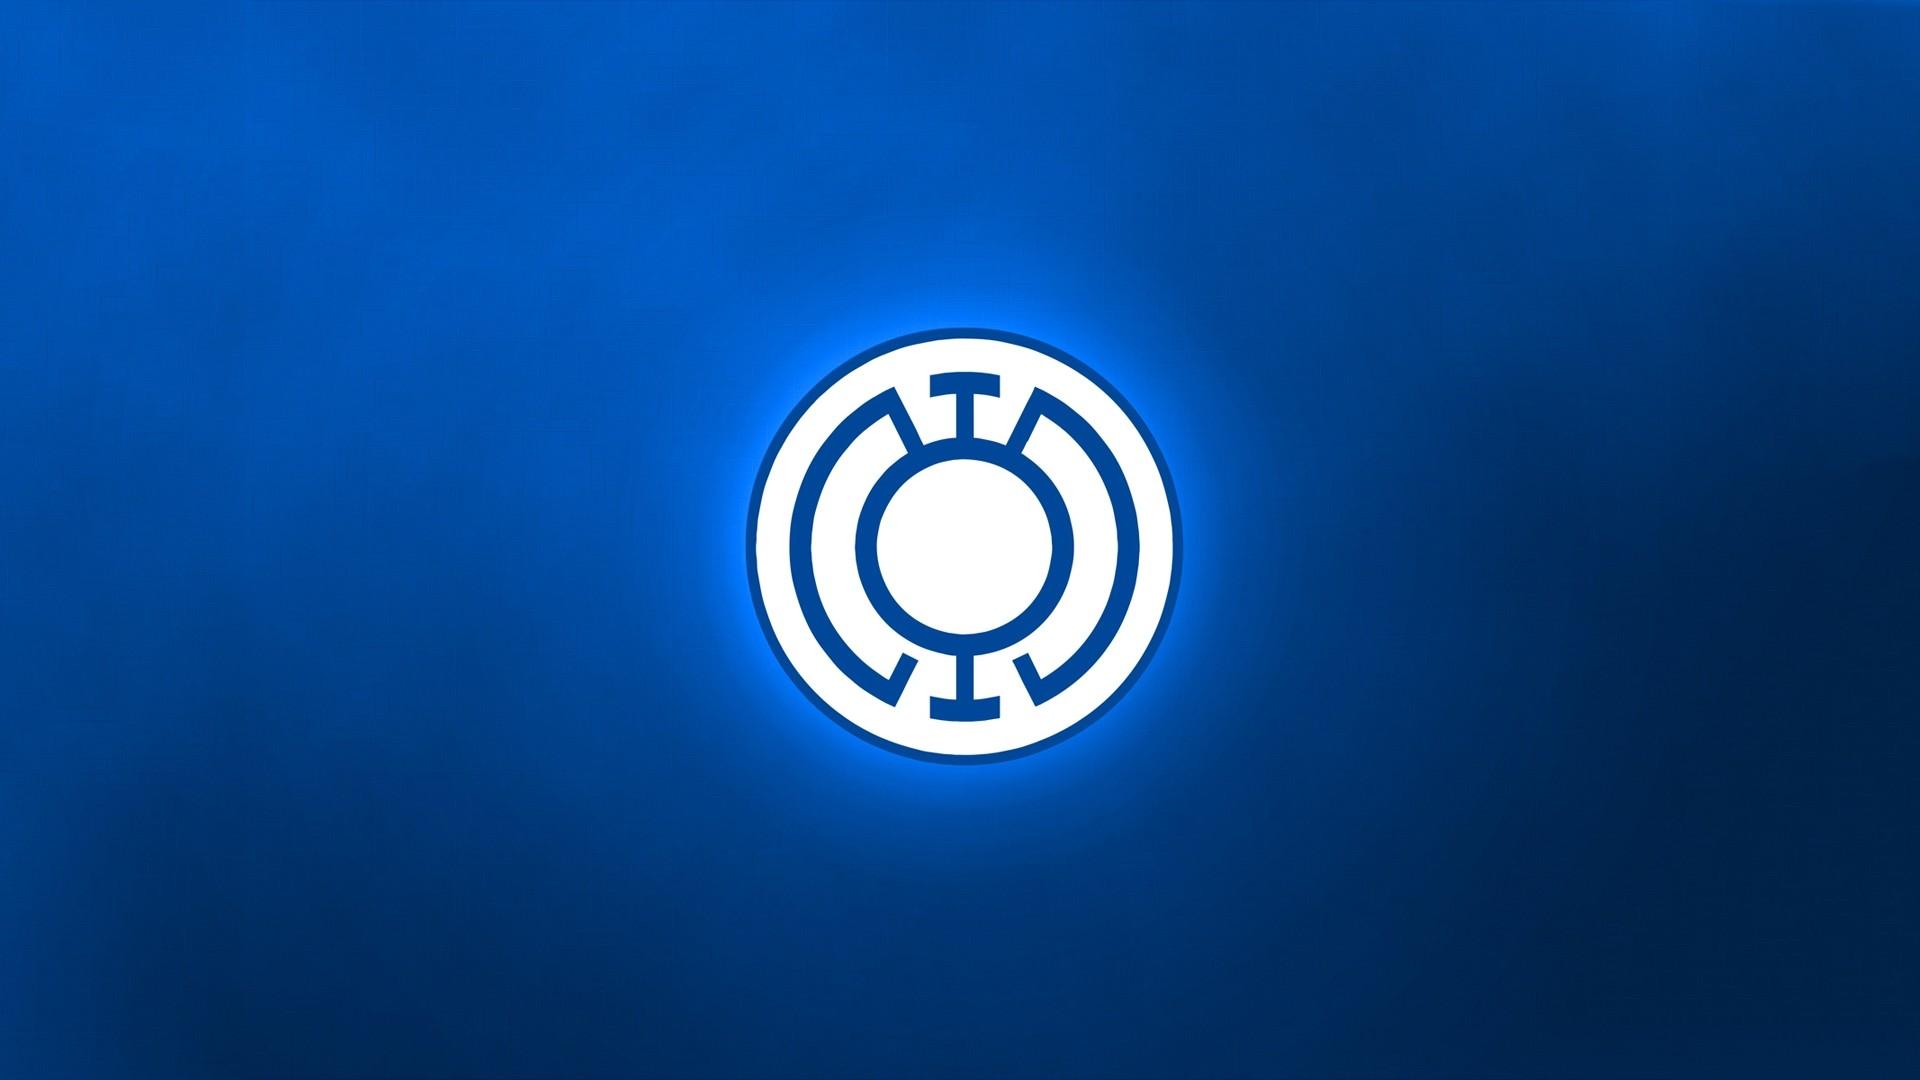 Blue Lantern Corps Computer Wallpaper, Desktop Background .